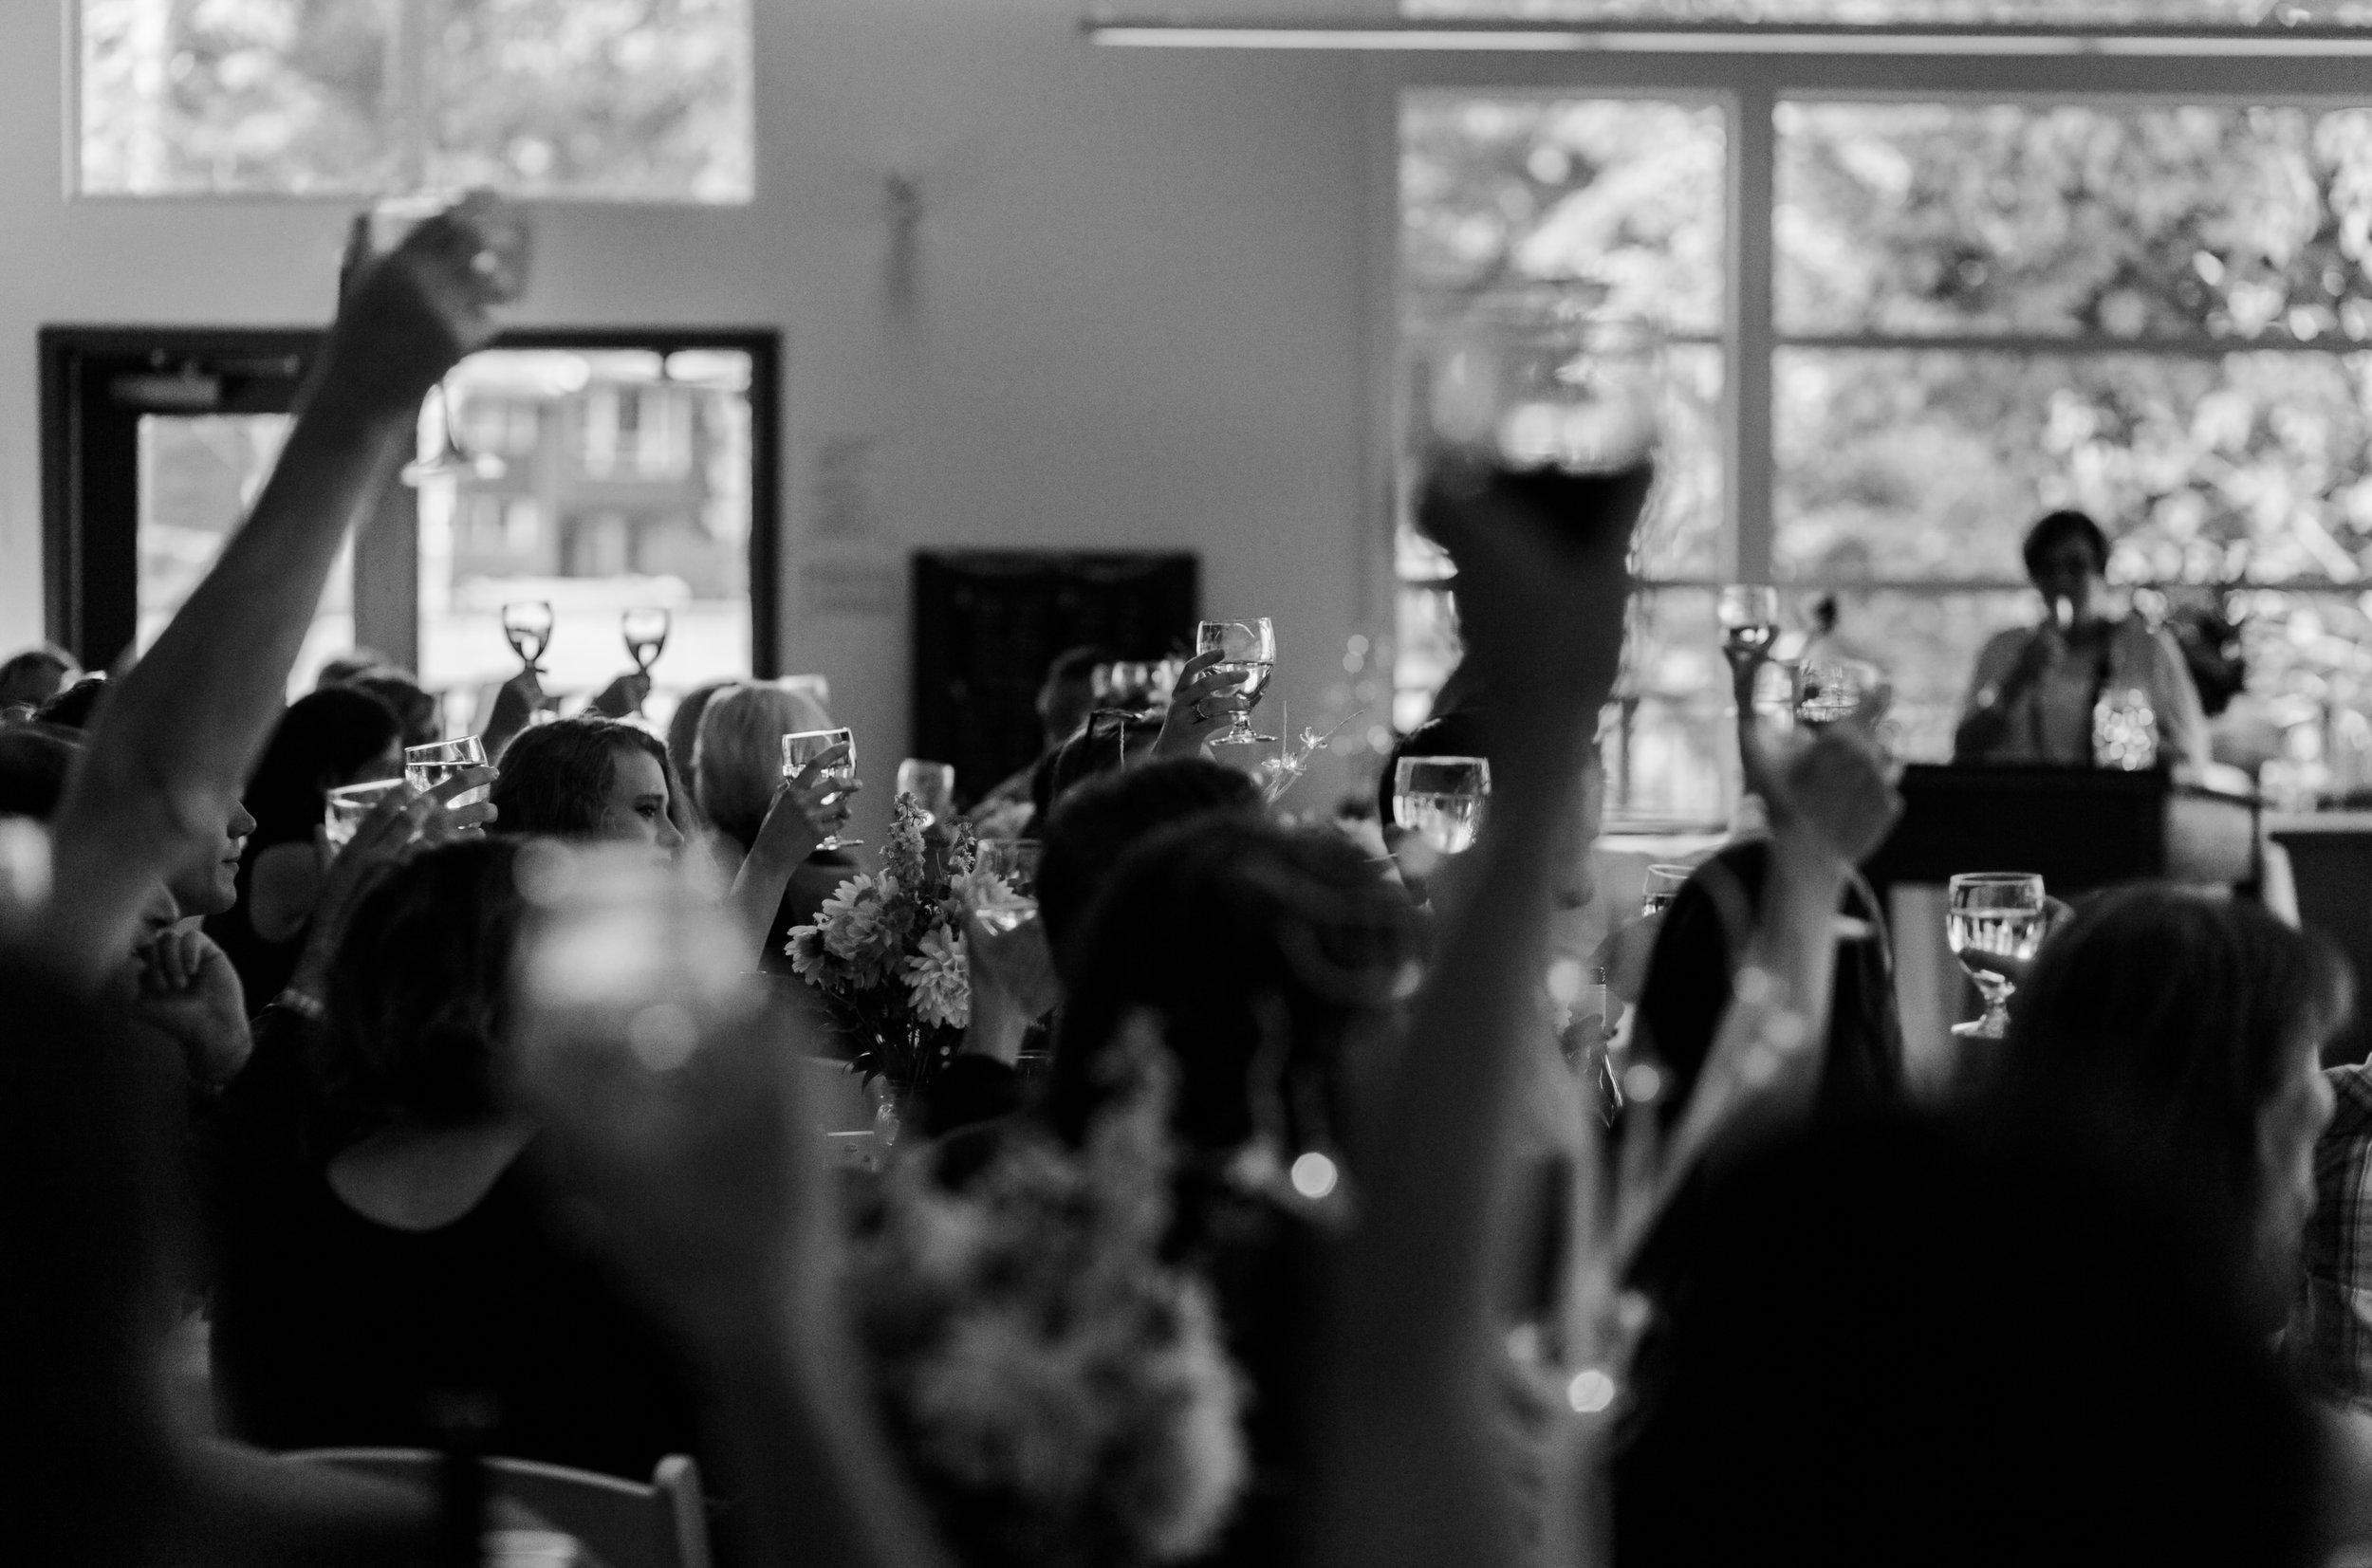 Camp Fircom Wedding - Vancouver Wedding Photographer & Videographer - Sunshine Coast Wedding Photos - Sunshine Coast Wedding Photographer - Jennifer Picard Photography - IMG_2430.jpg